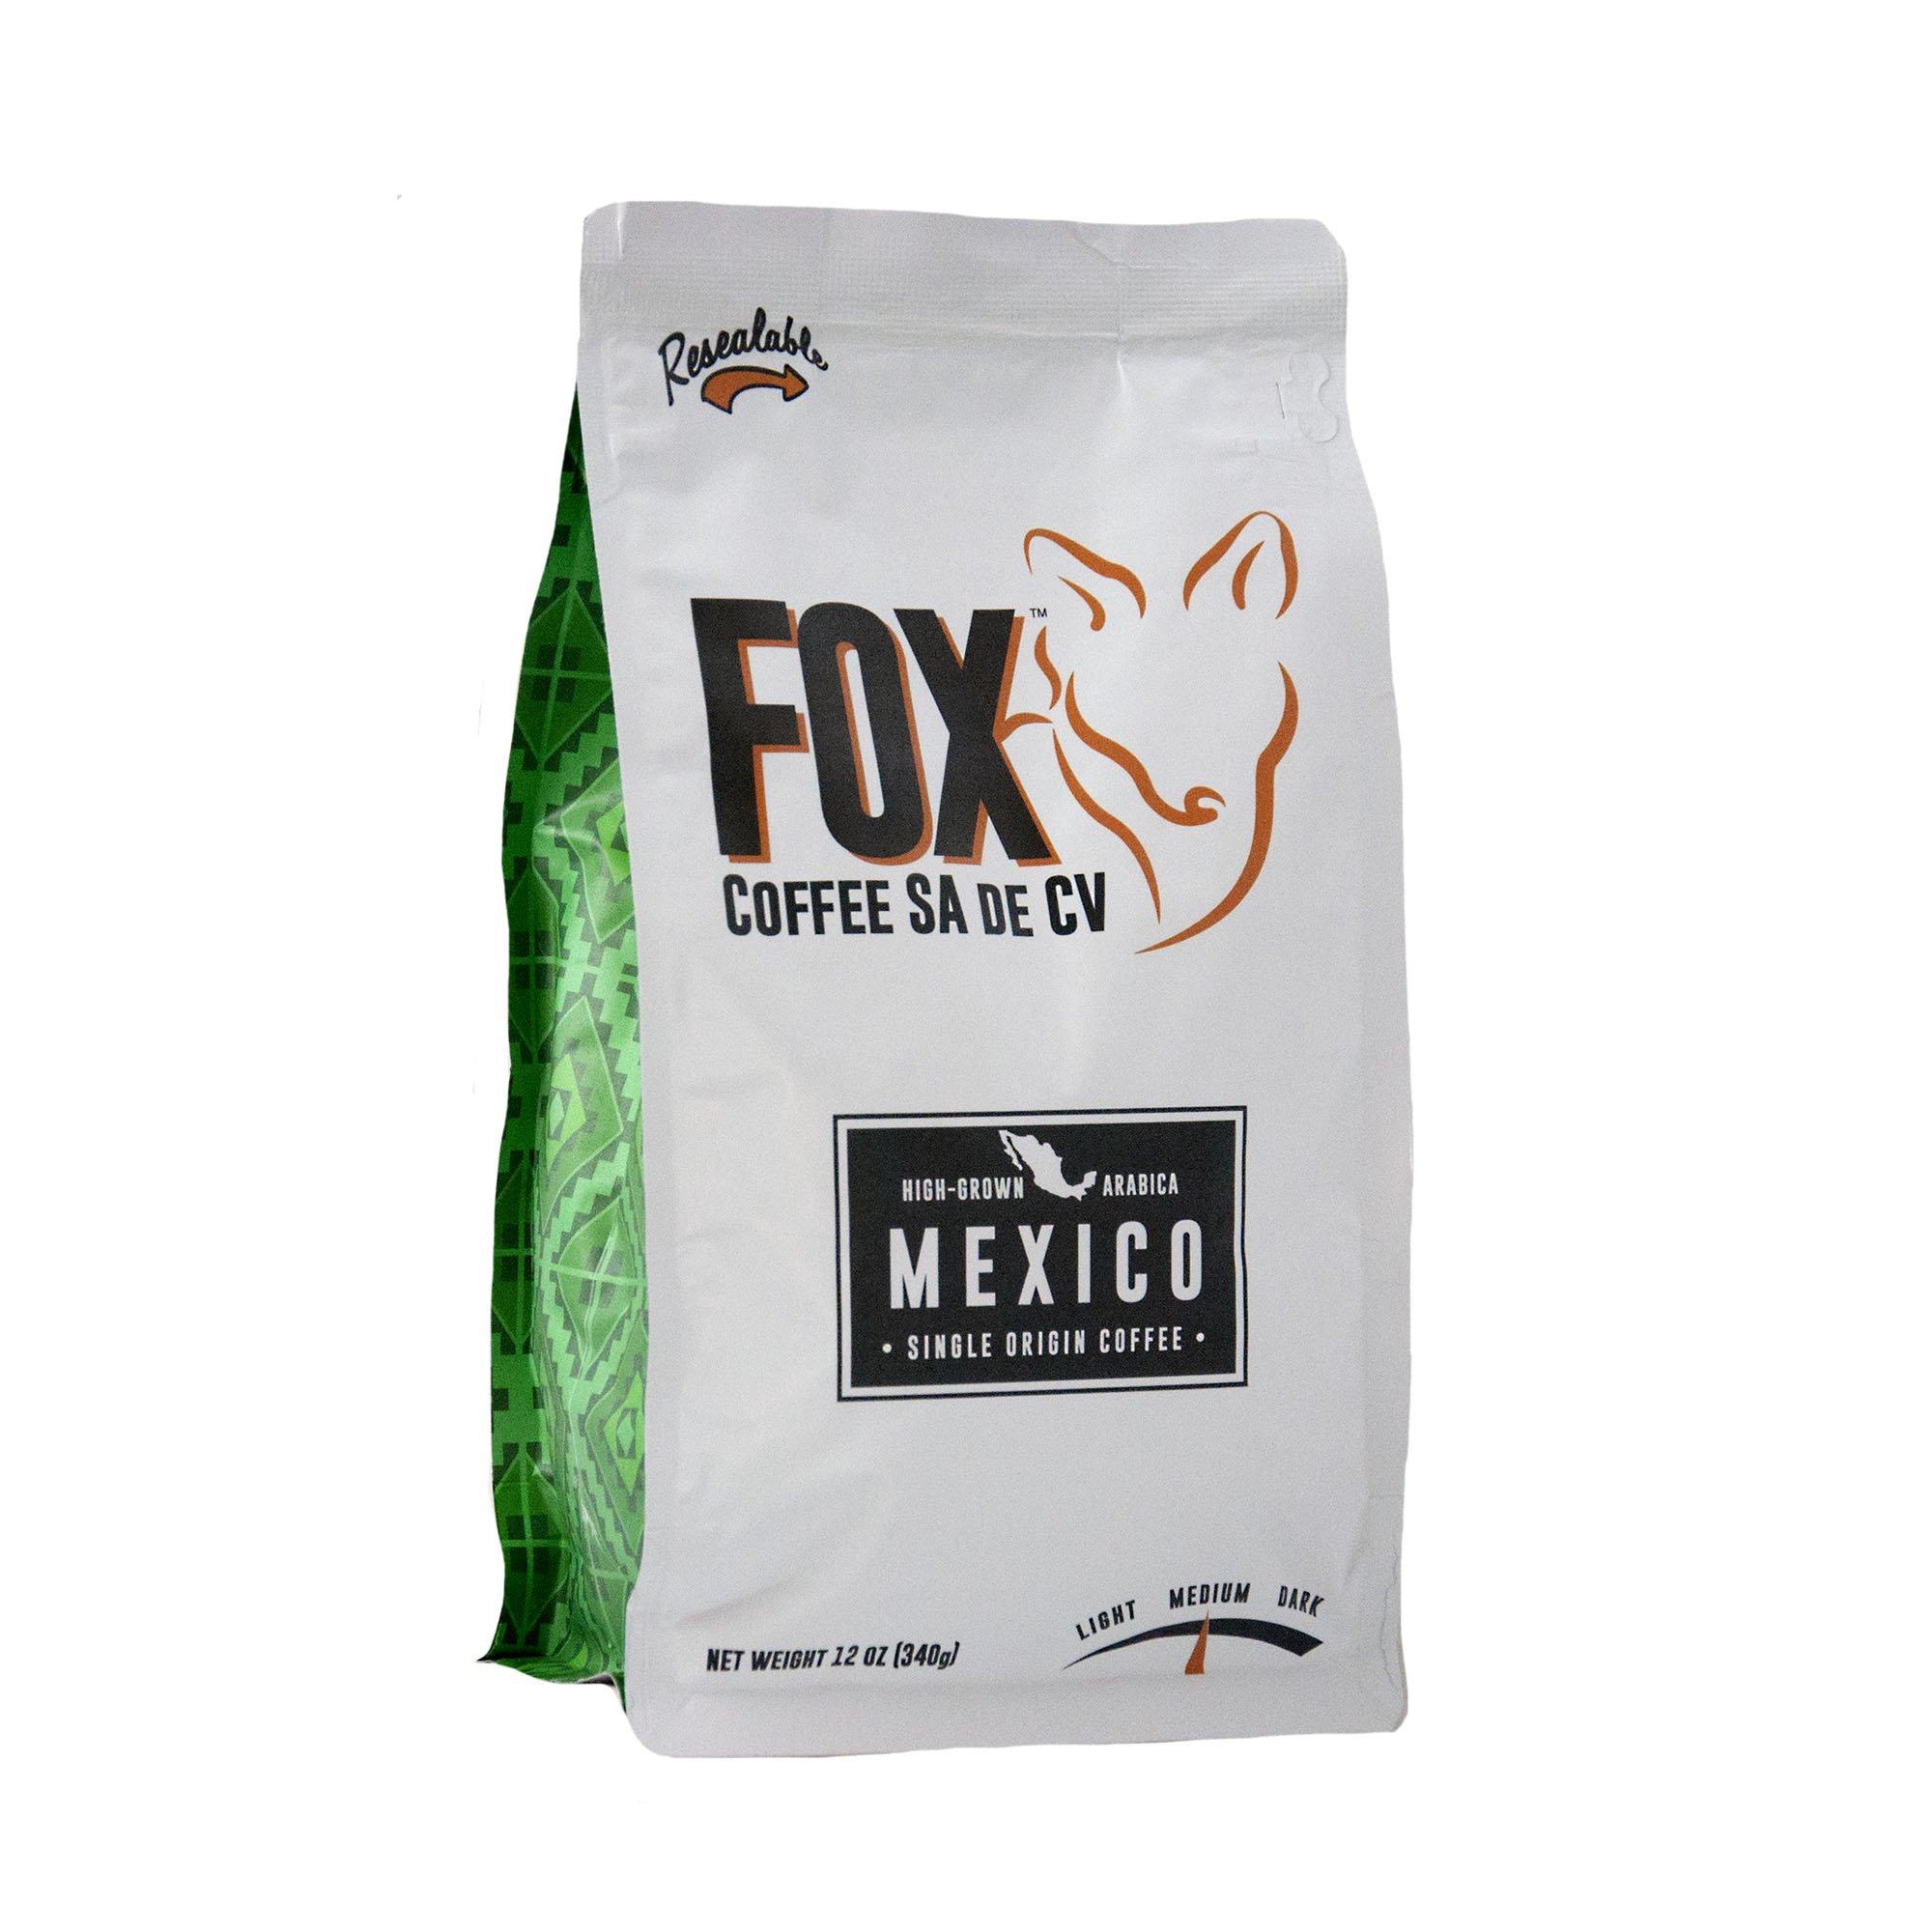 Fox Coffee Ground Medium Roast Fresh Mexican Coffee - 100% Arabica Coffee - 12 Oz. Resealable Bag Gourmet Coffee